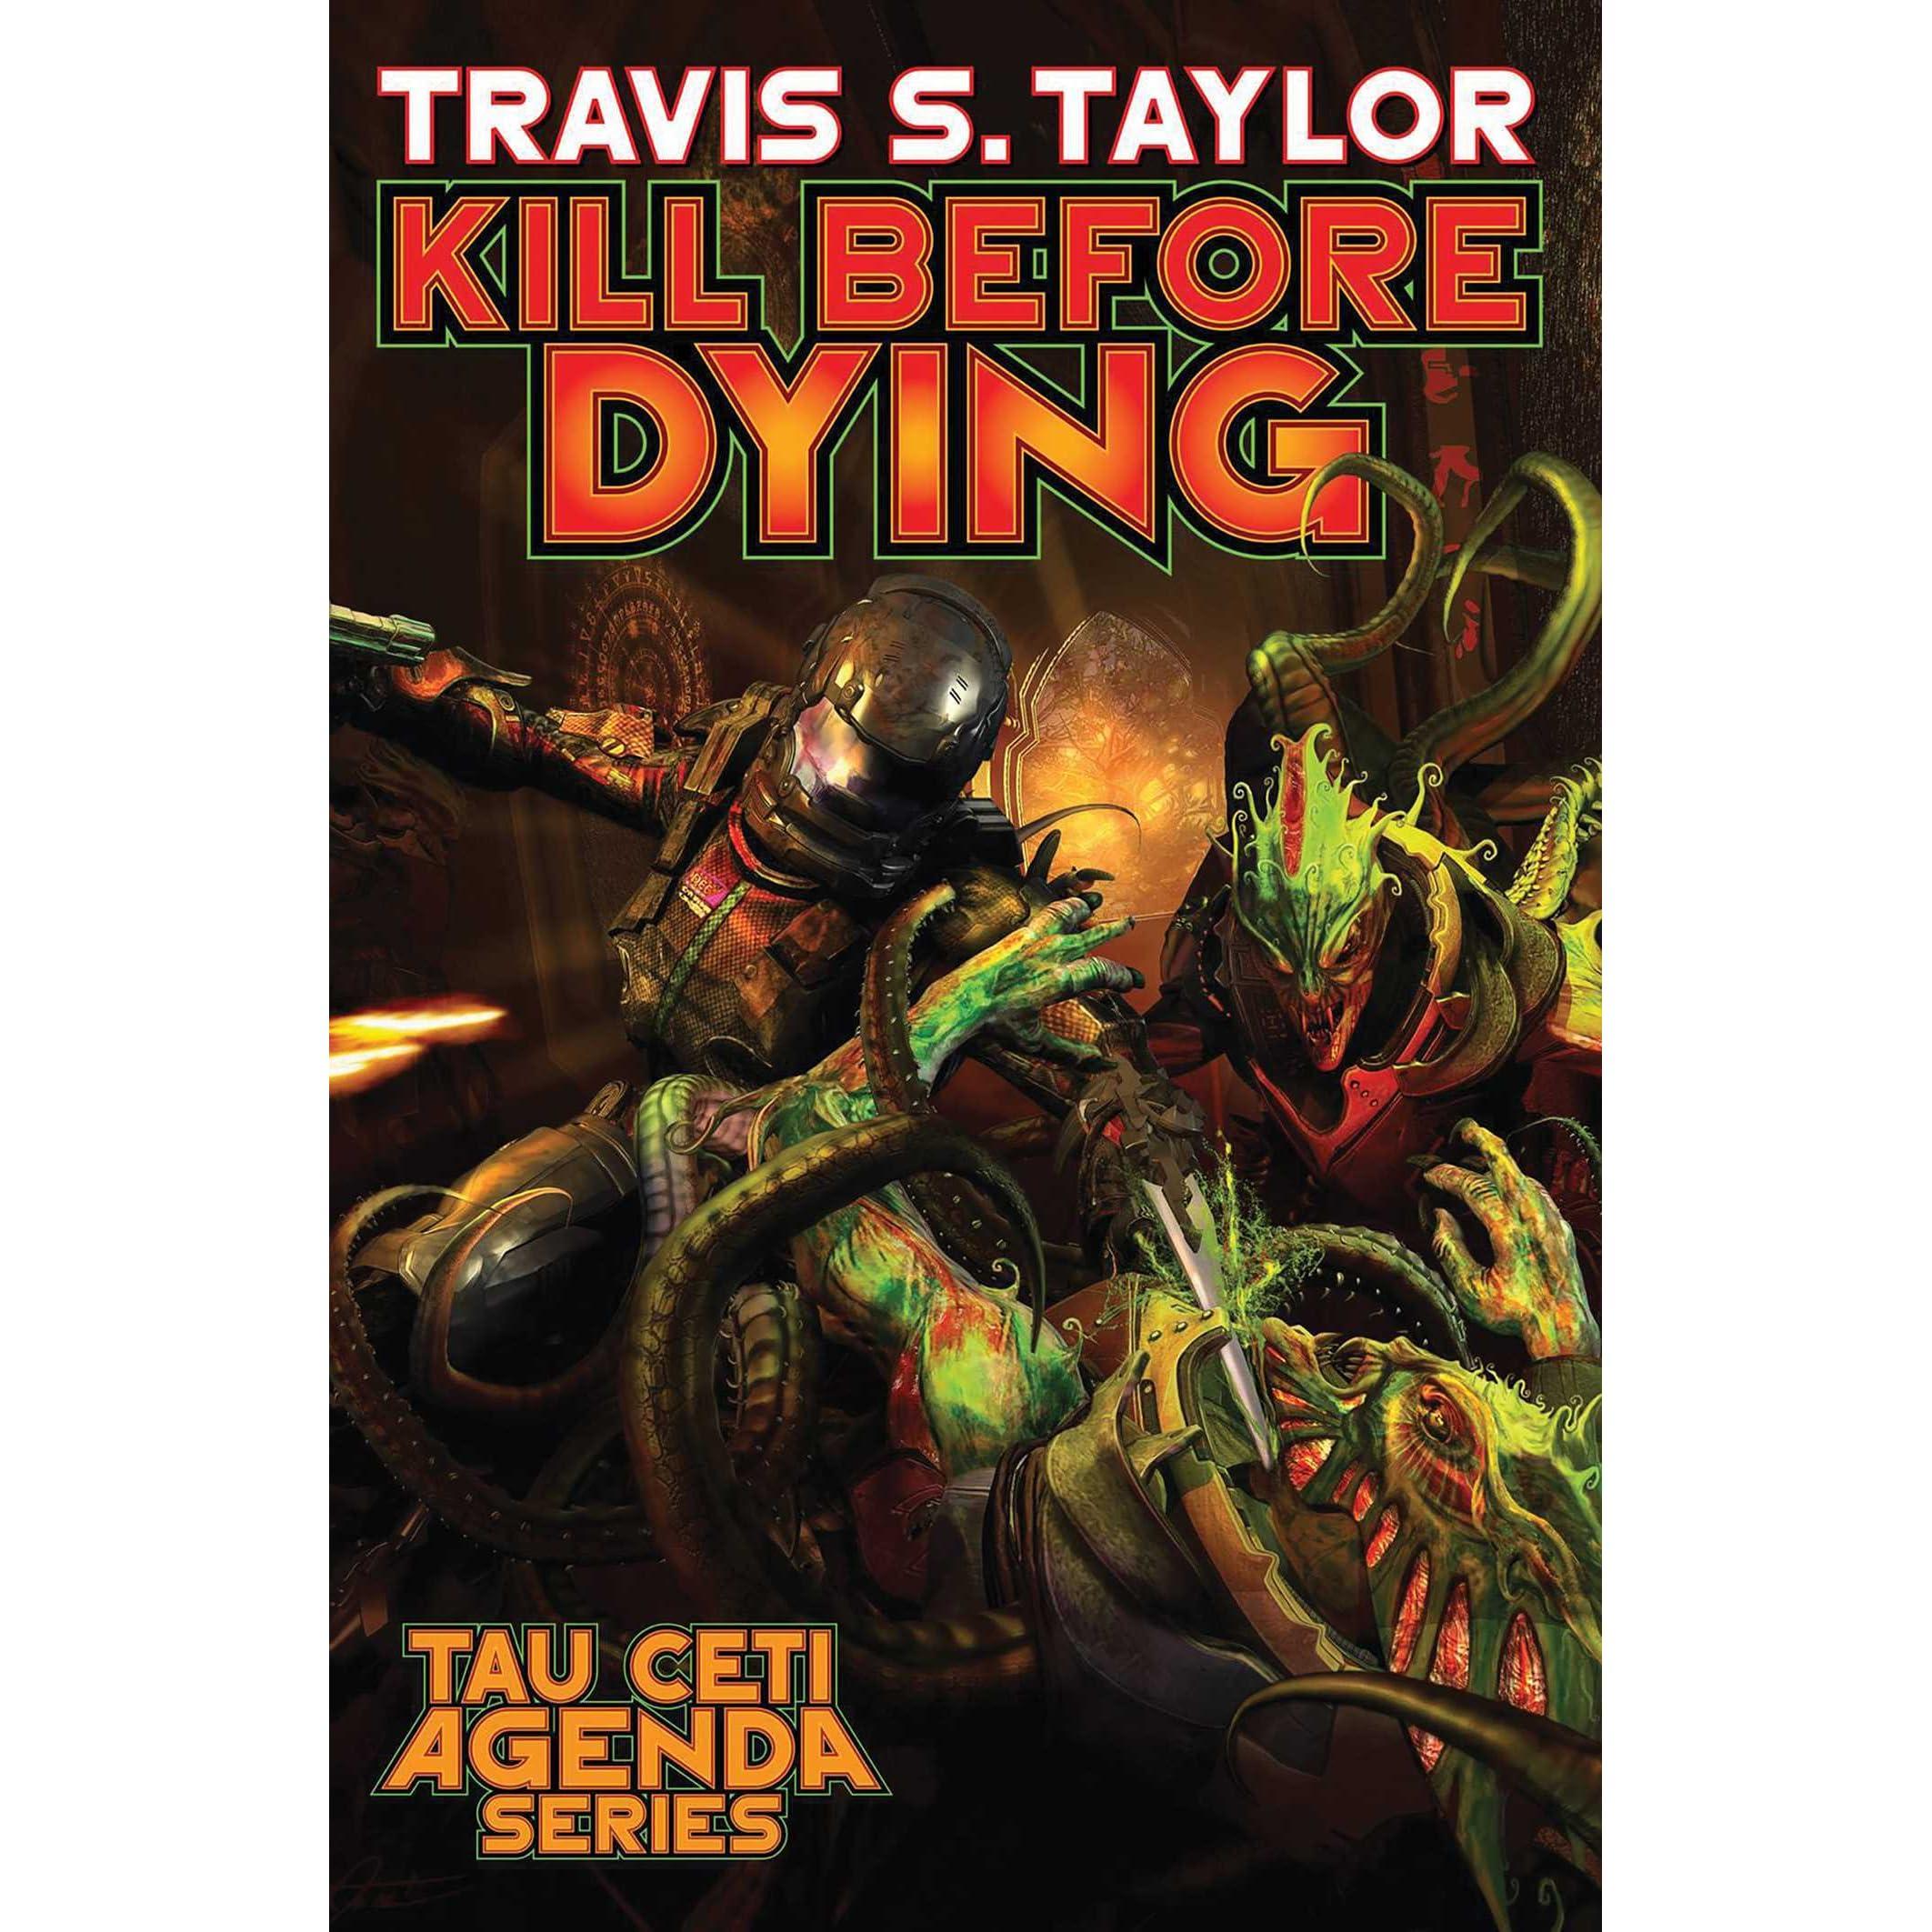 Kill Before Dying (Tau Ceti Agenda Book 5)